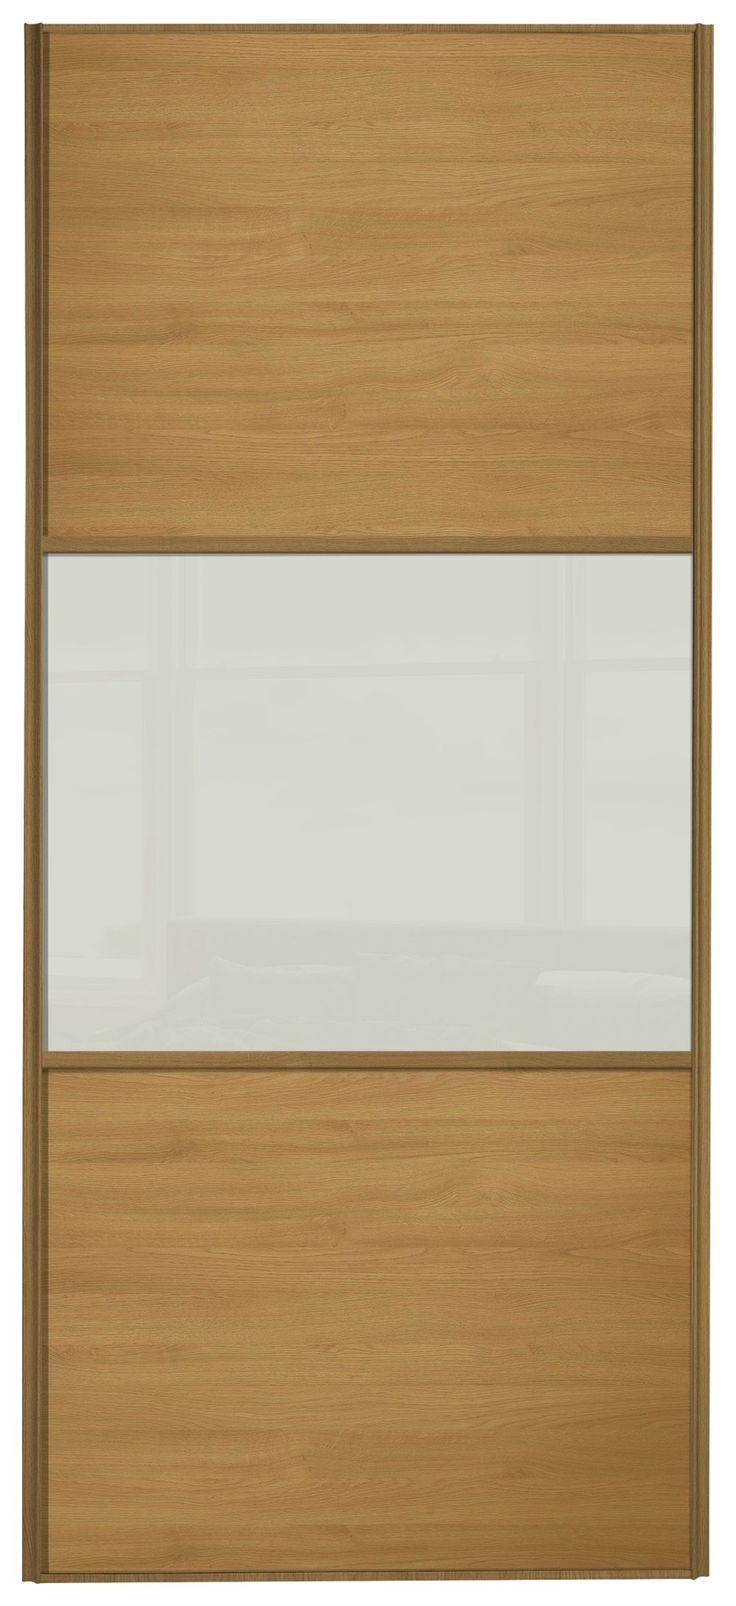 Alfa img showing gt glass hangar doors - Sliding Wardrobe Door W762mm 3 Panel Oak Soft White Glass Simple Yet Contemporary